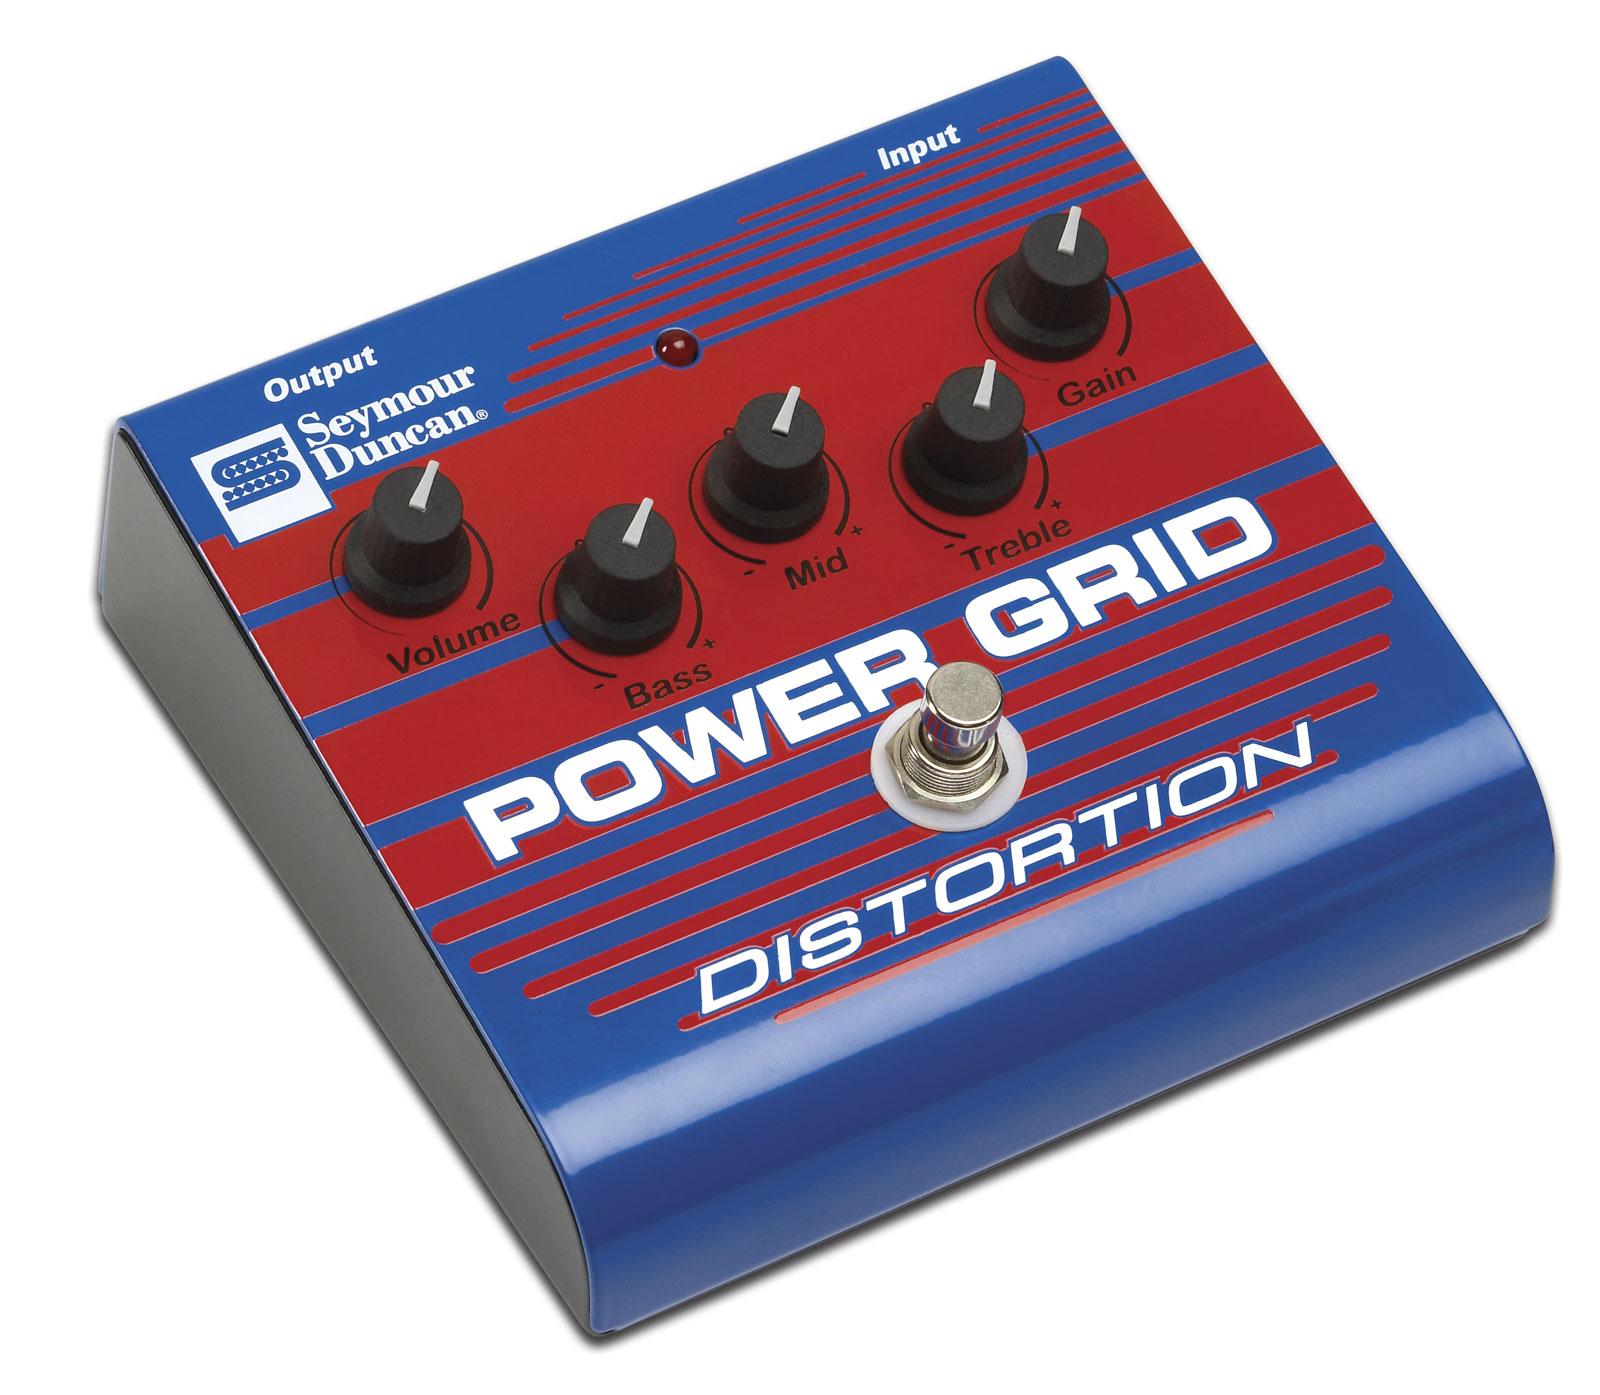 seymour duncan sfx 08 power grid distortion guitar effects pedal distortion pedal mydukkan. Black Bedroom Furniture Sets. Home Design Ideas